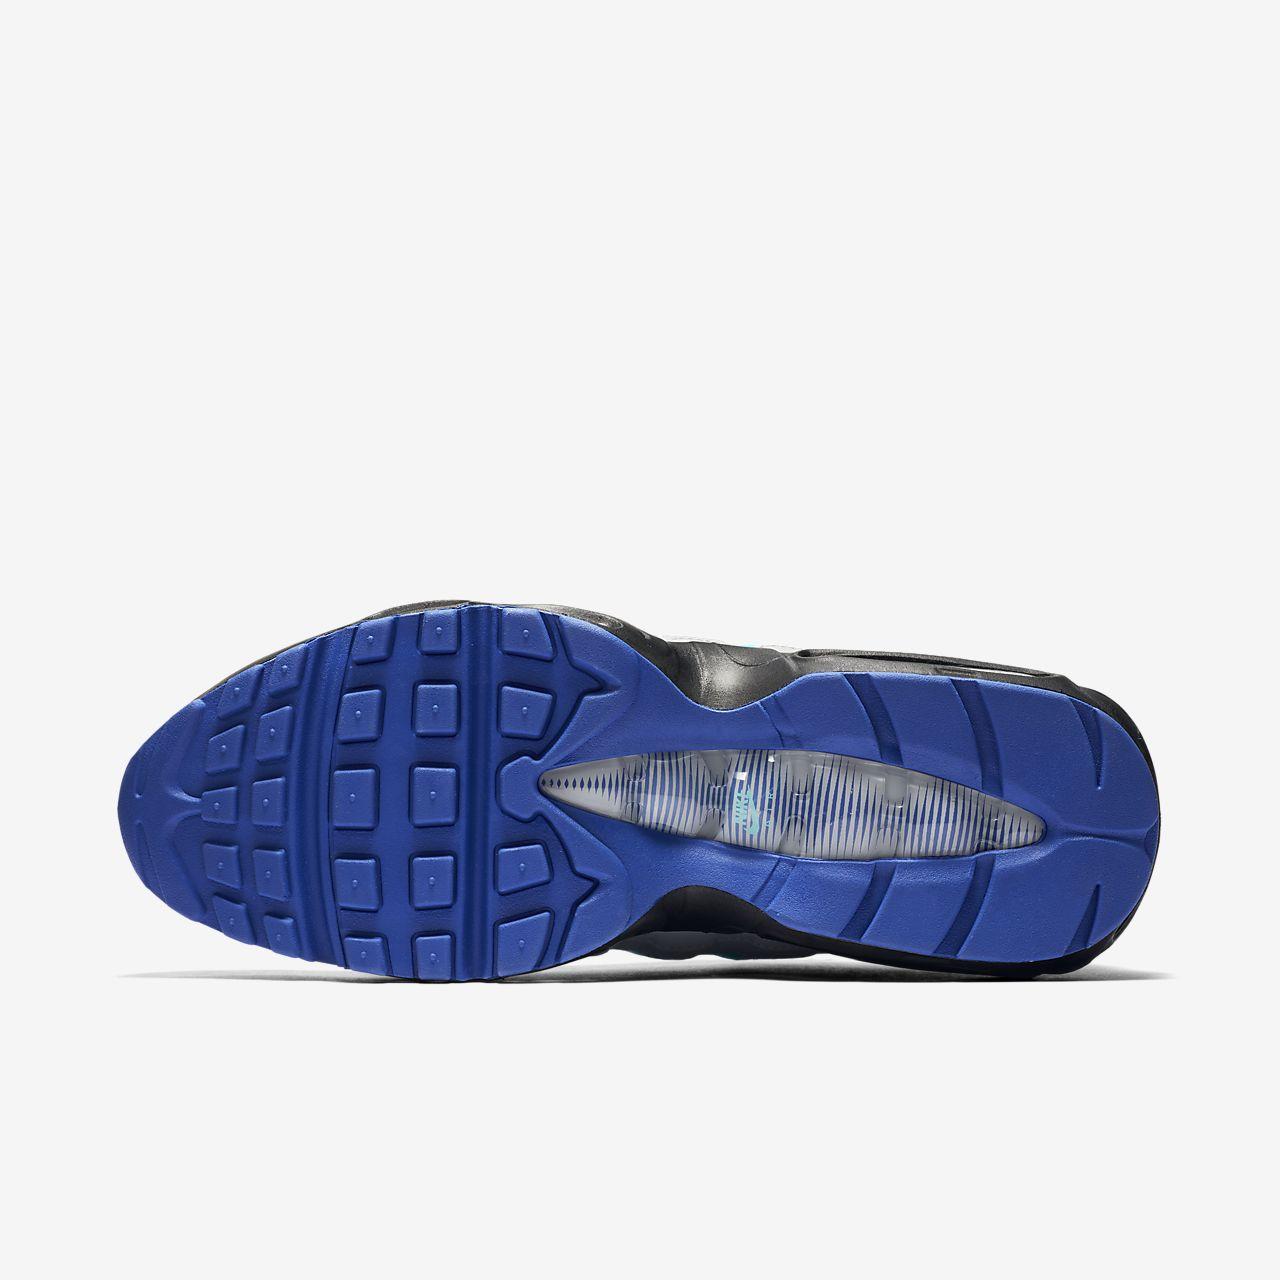 watch c958c 75878 ... Nike Air Max 95 OG Shoe